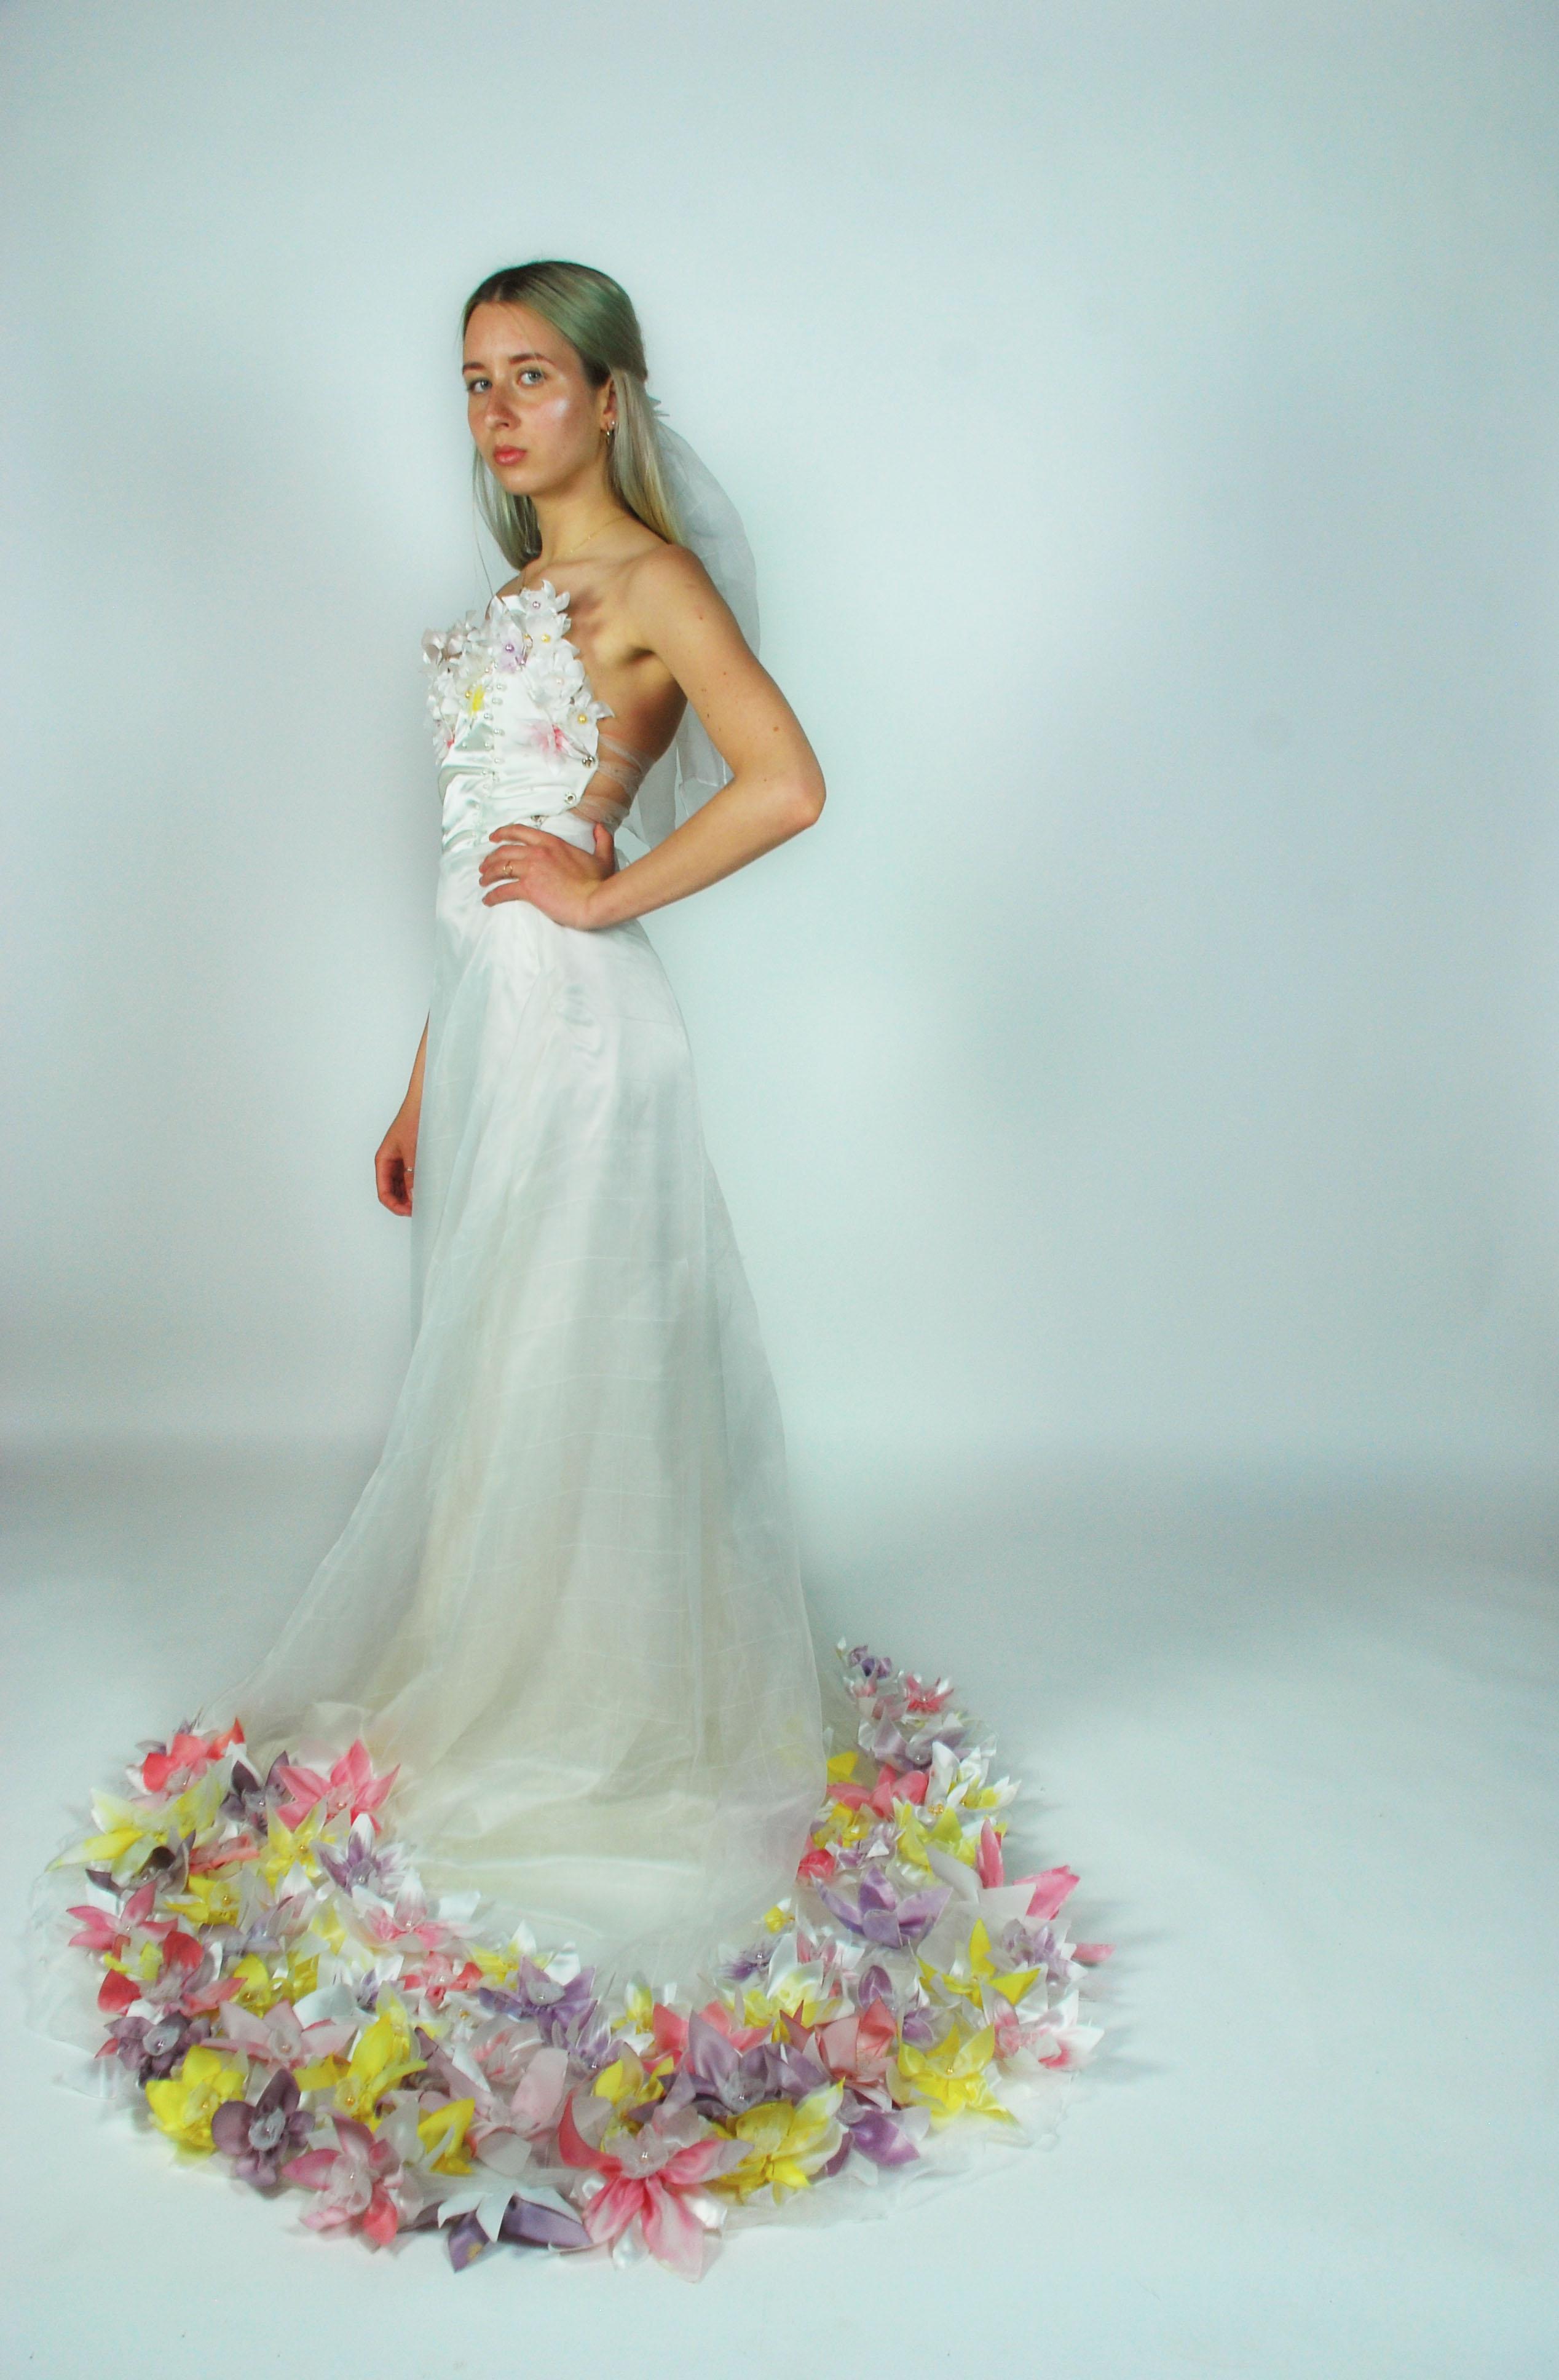 bridal 4 edited.jpg